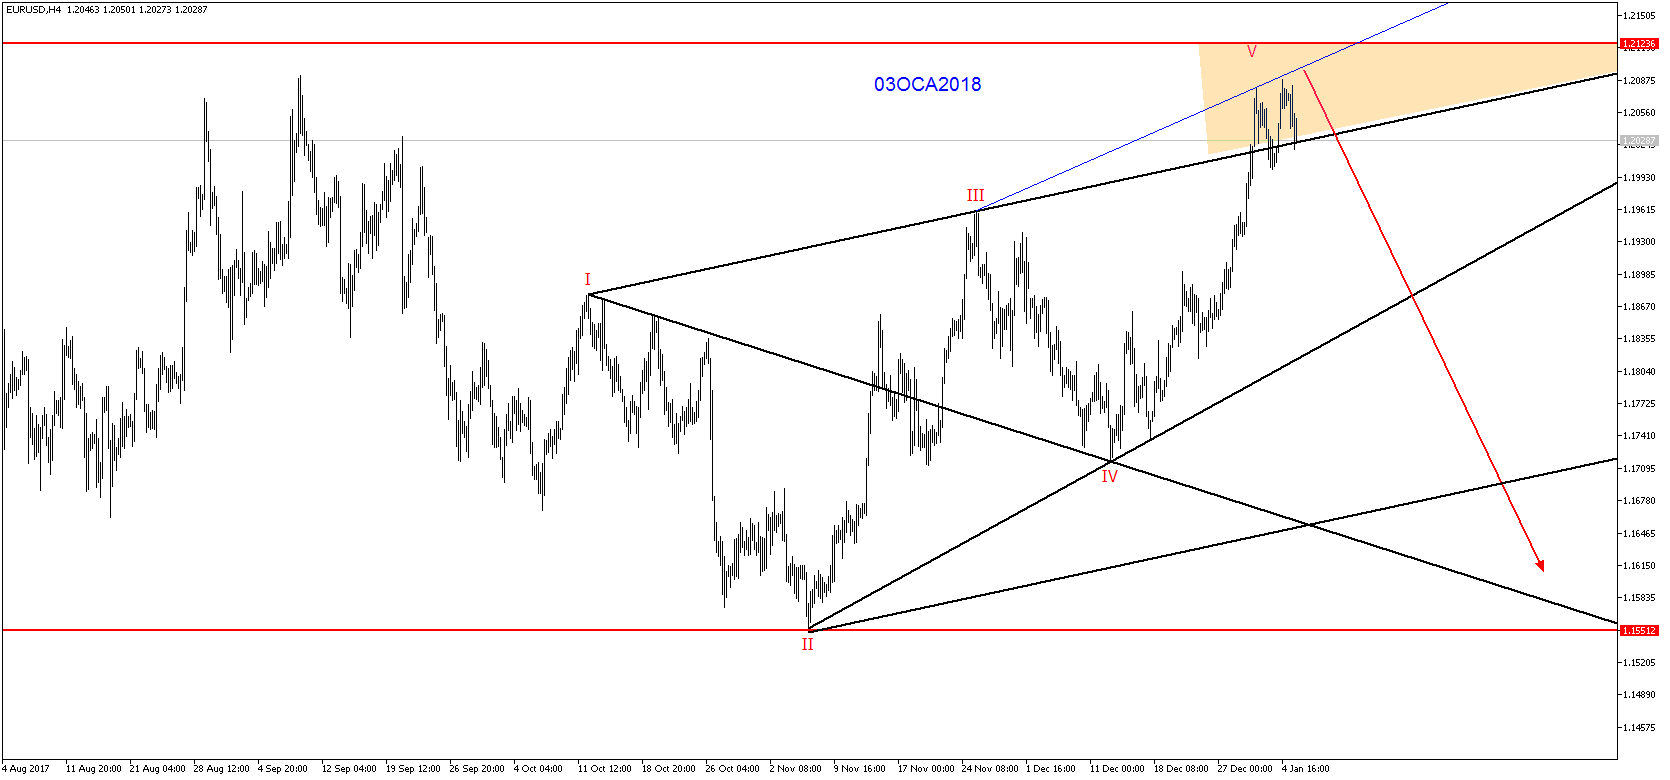 Eurusdh4 06Oca2018